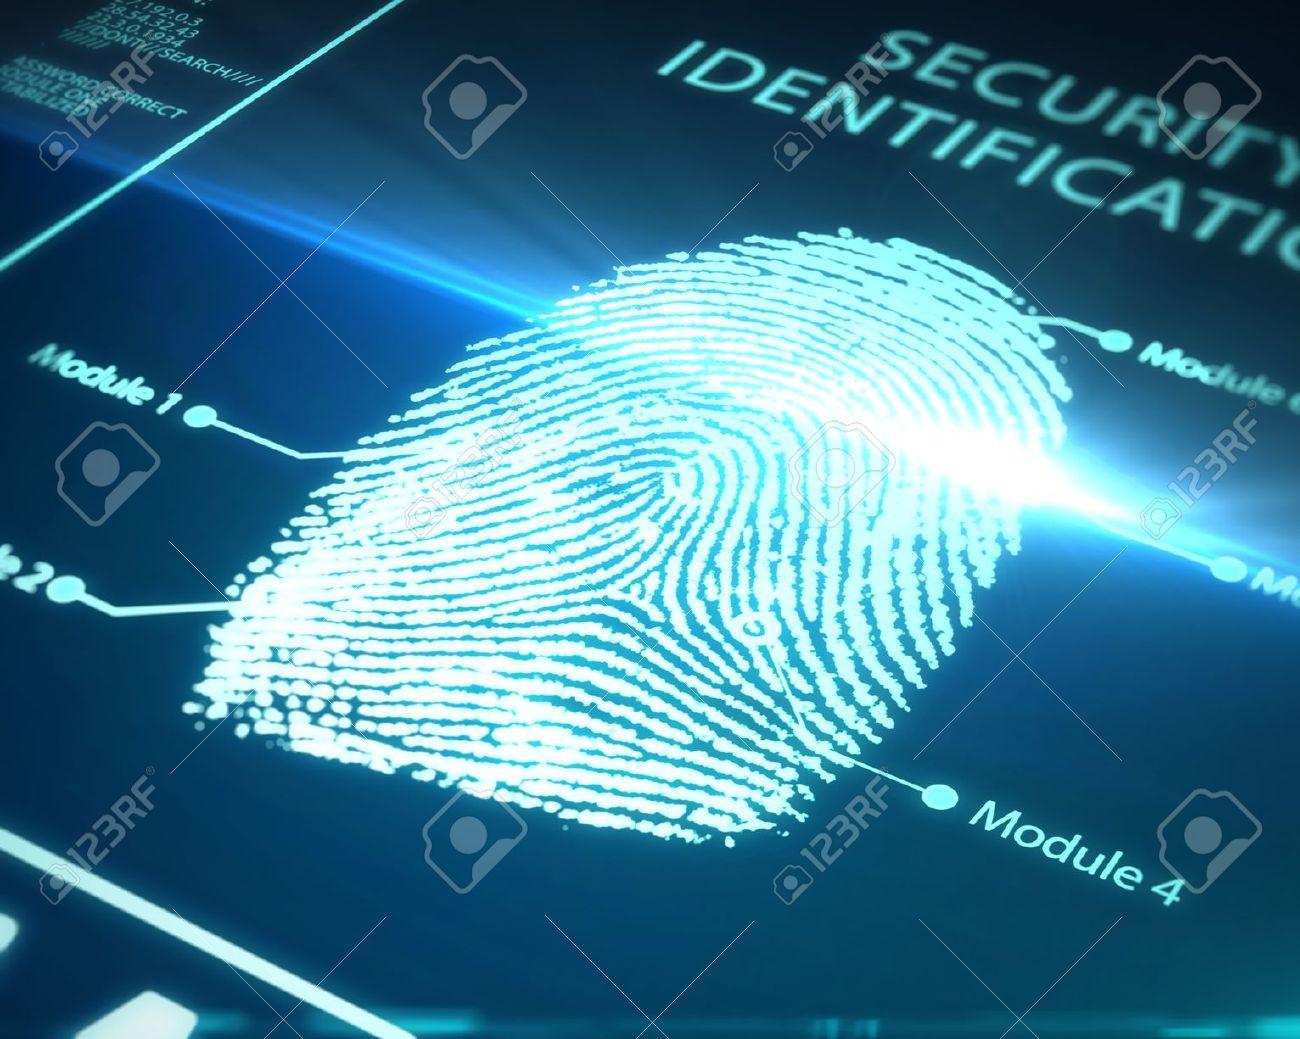 Fingerprint Identification On A Blue Background Stock Photo ...